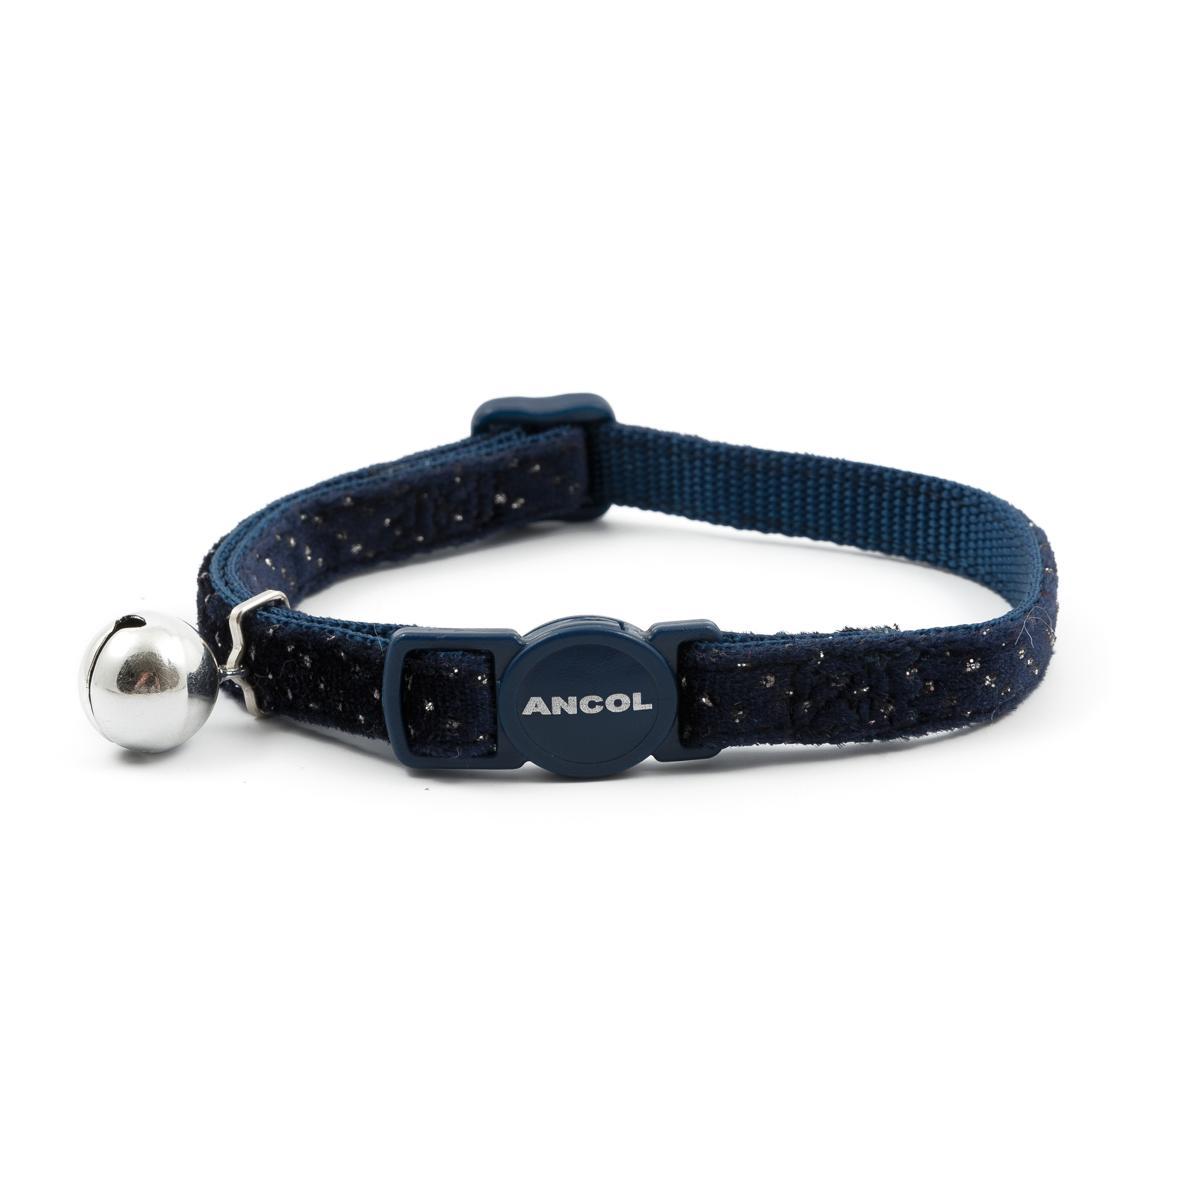 CLEARANCE ANCOL Velvet Sparkle Cat Collar Navy Blue 20-30cm